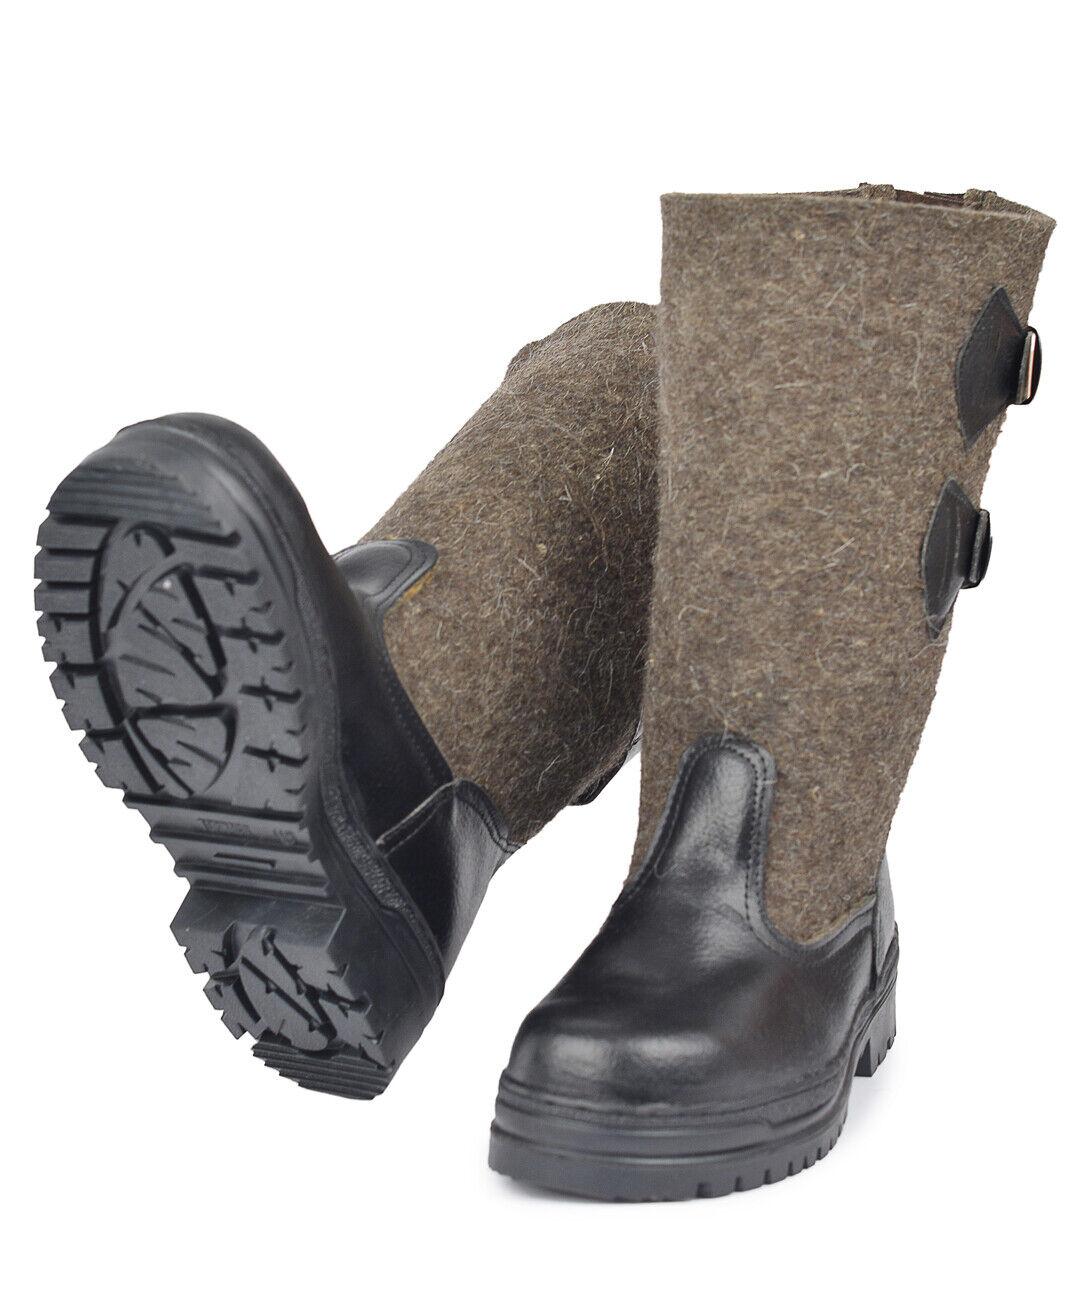 Original Russian felt boots valenki for ice fishing,hunting.russian winter boots